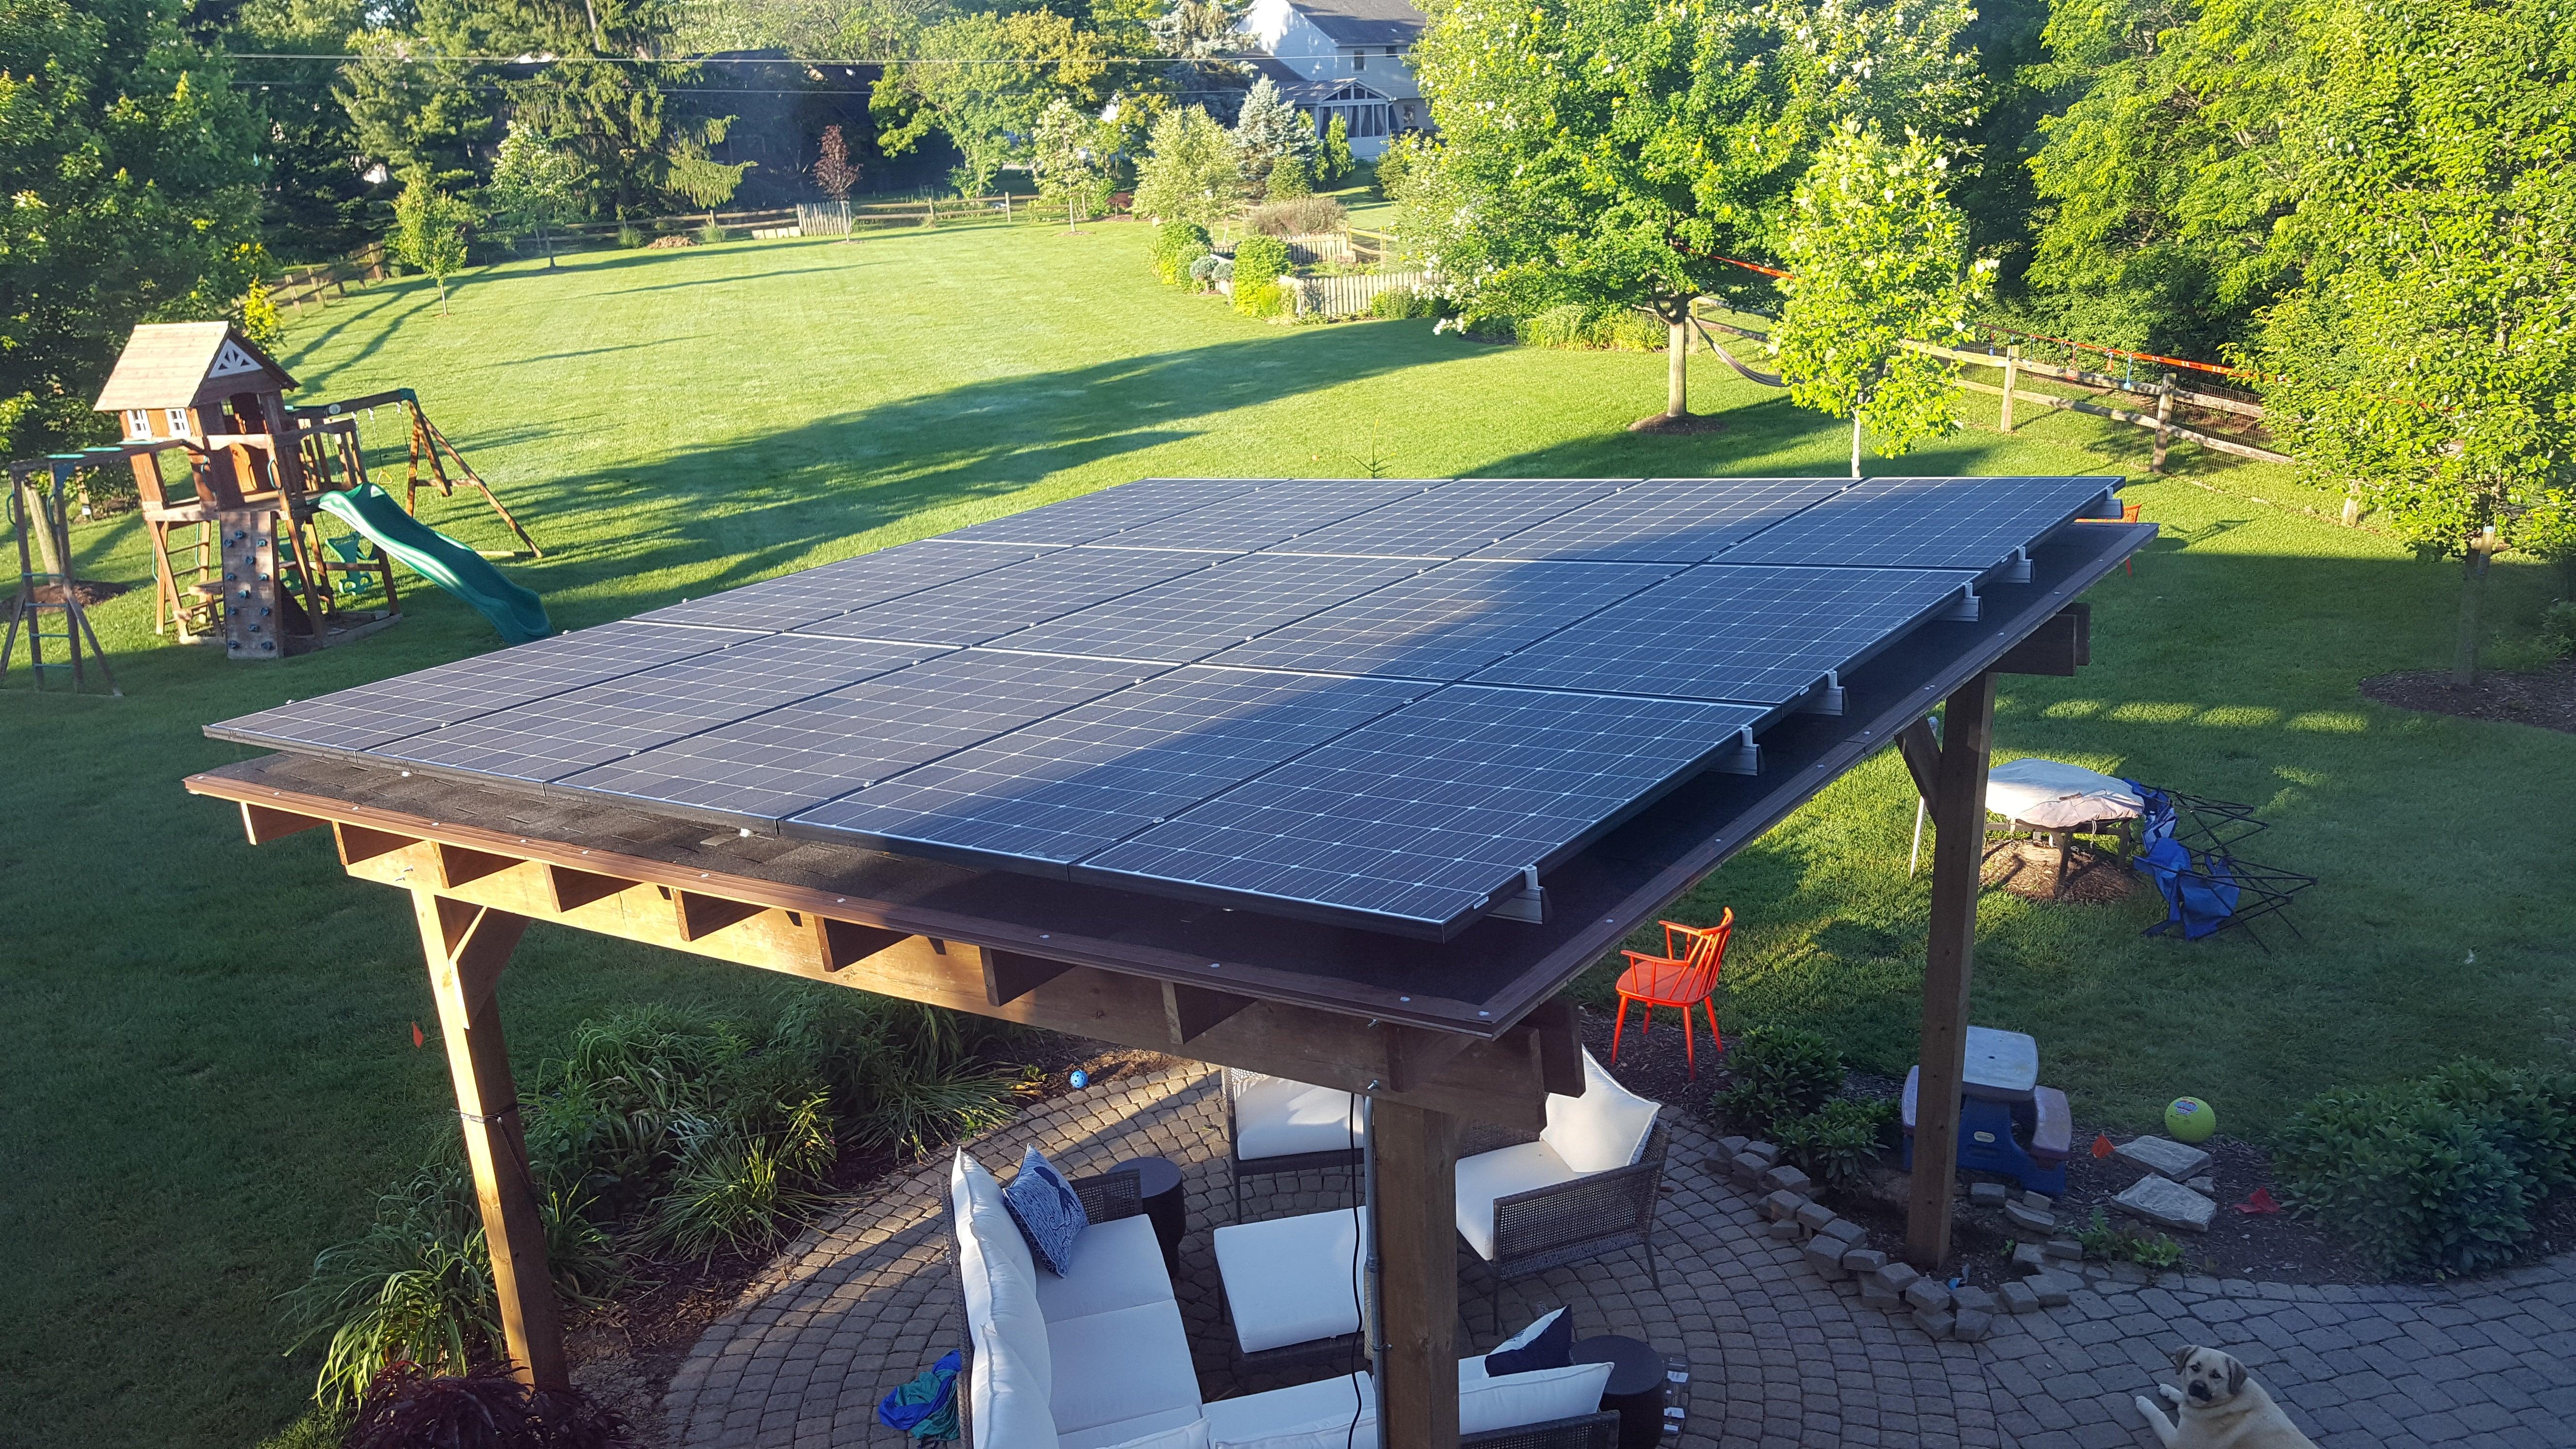 worthington solar co-op